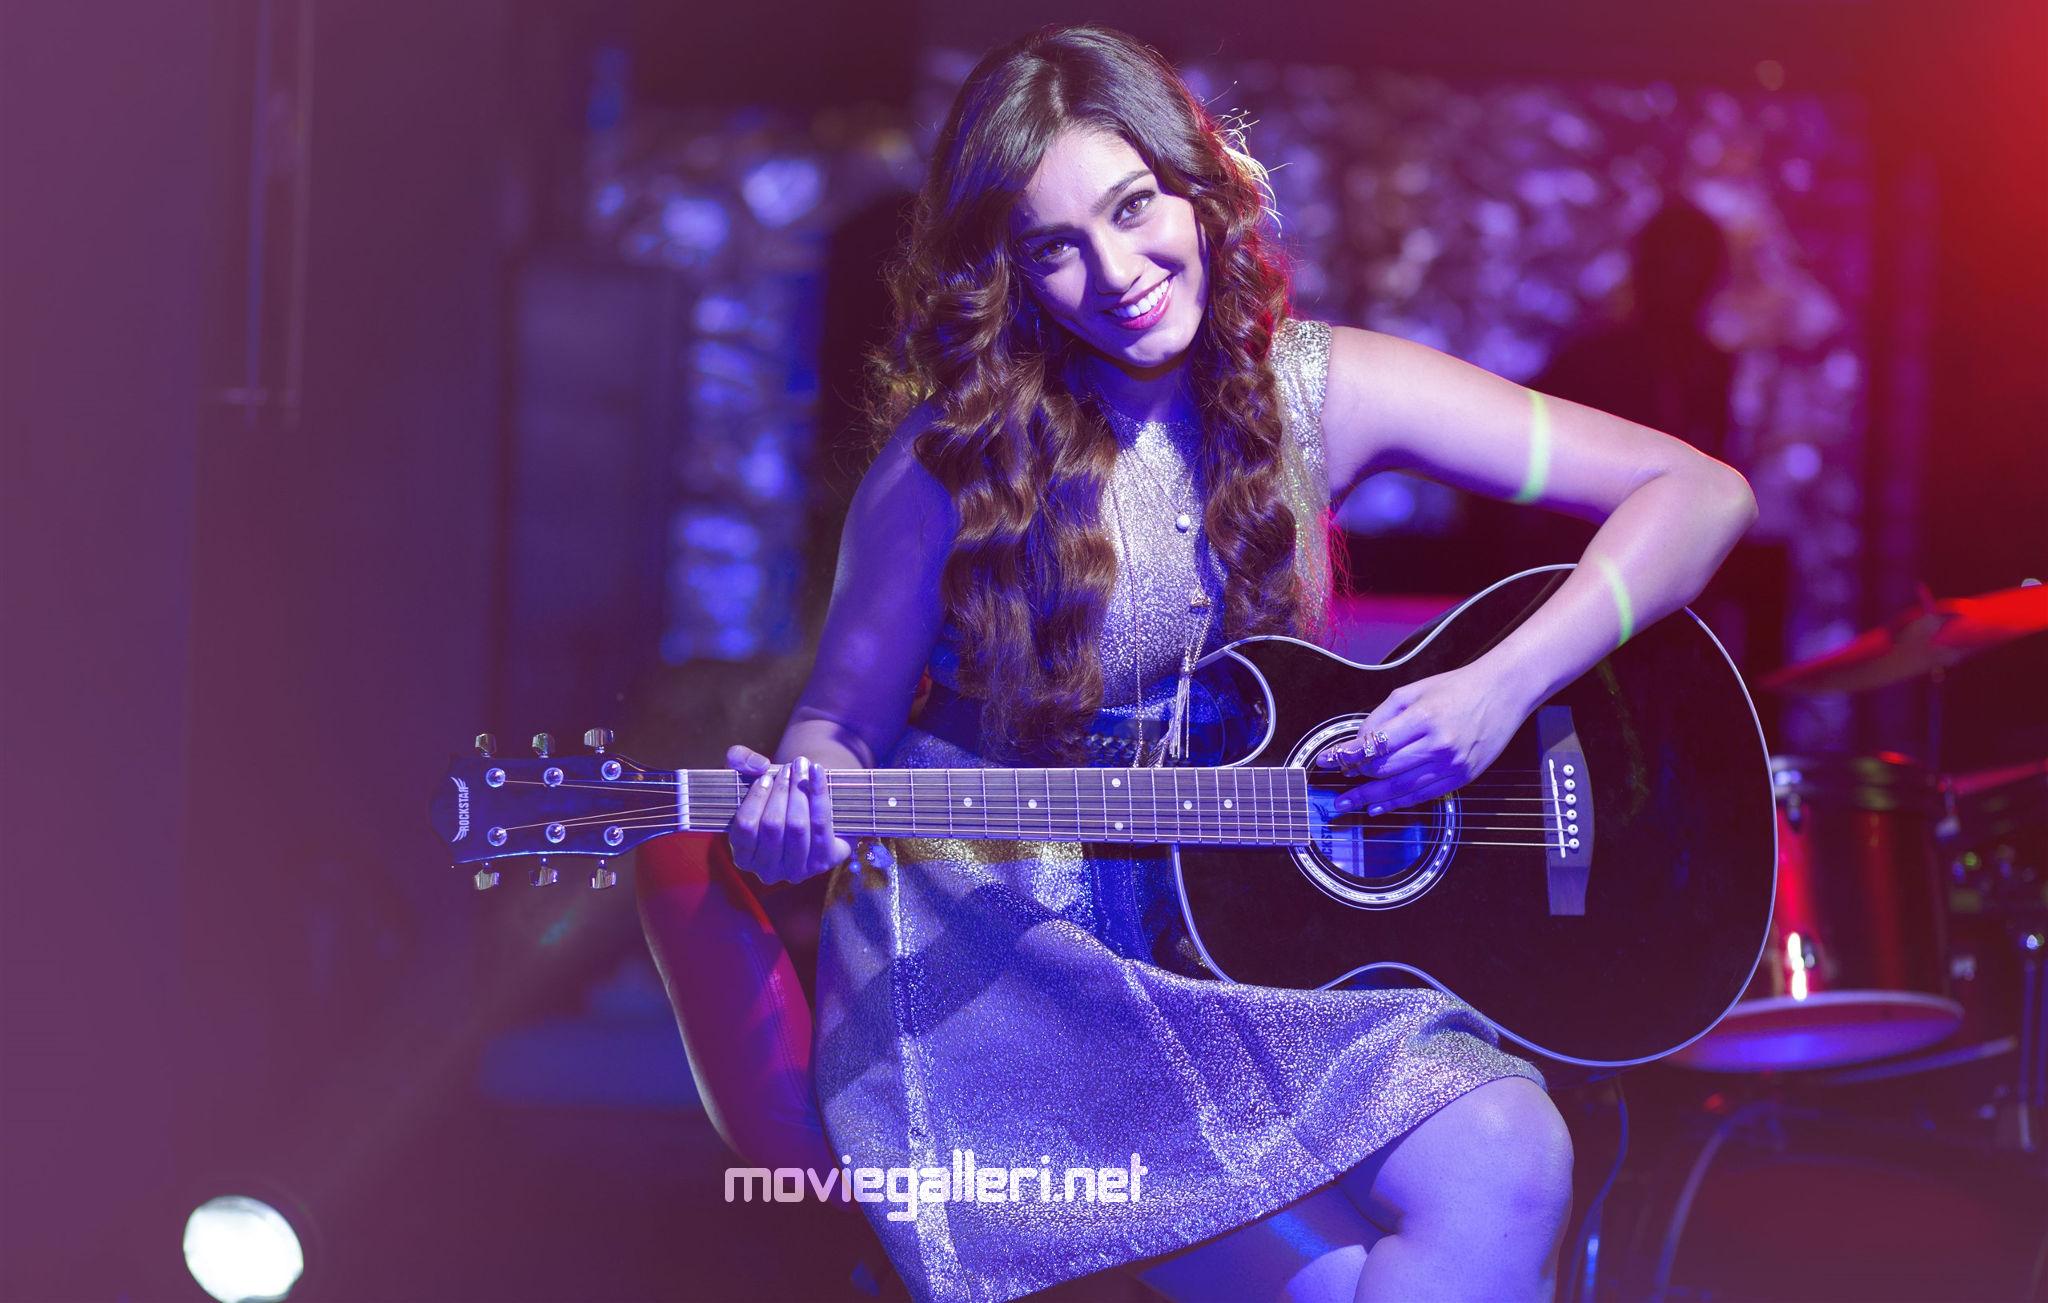 Rangoon Movie Actress Sana Makbul Stills HD Images